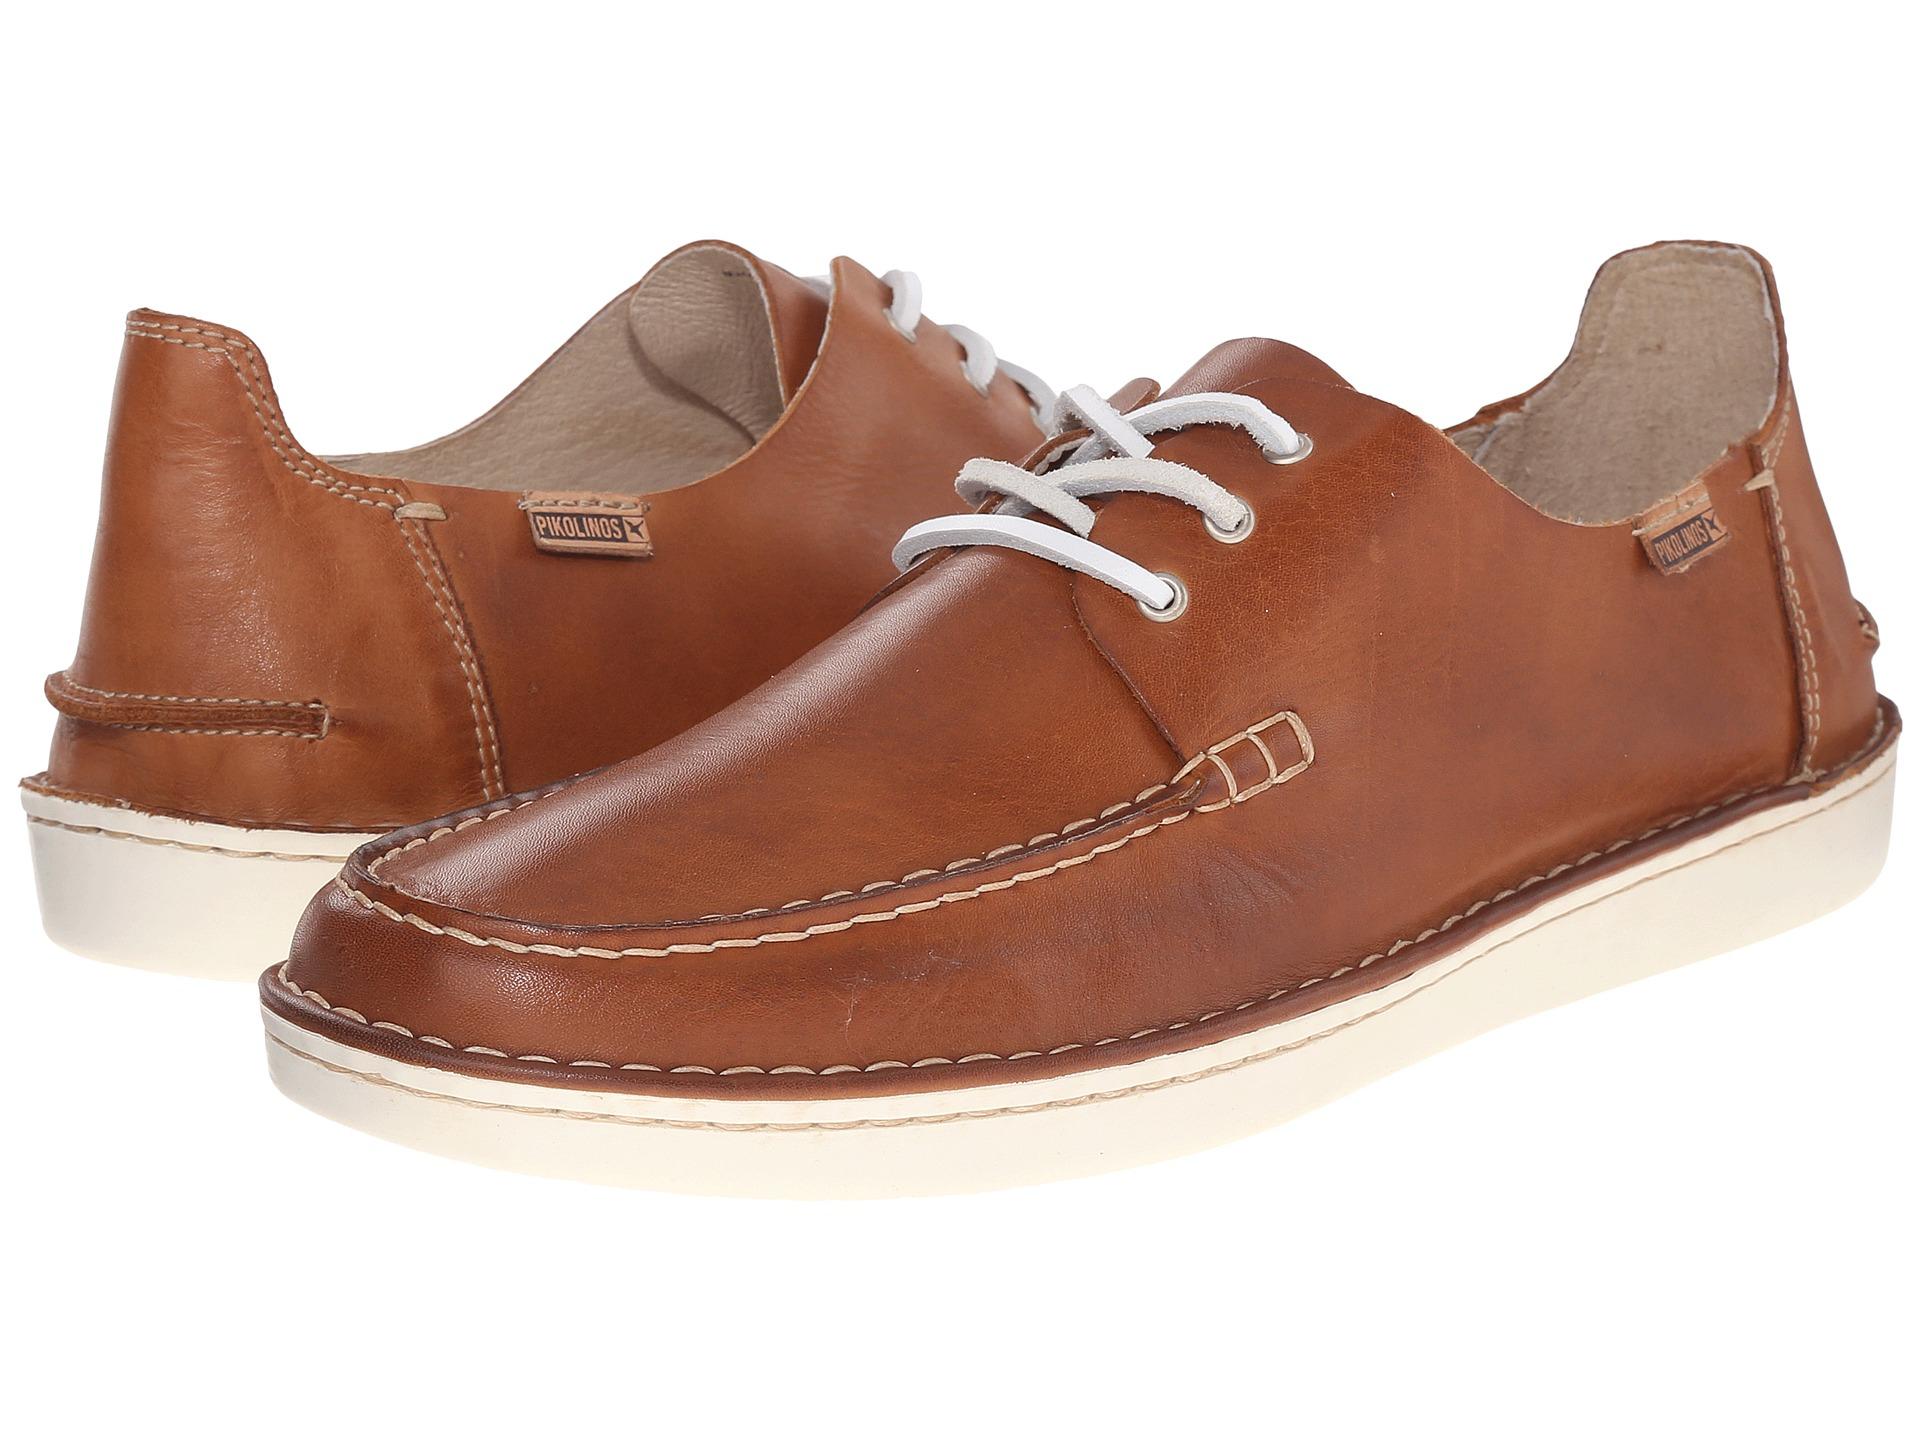 American Shoe Size  Is What Size In Kenya